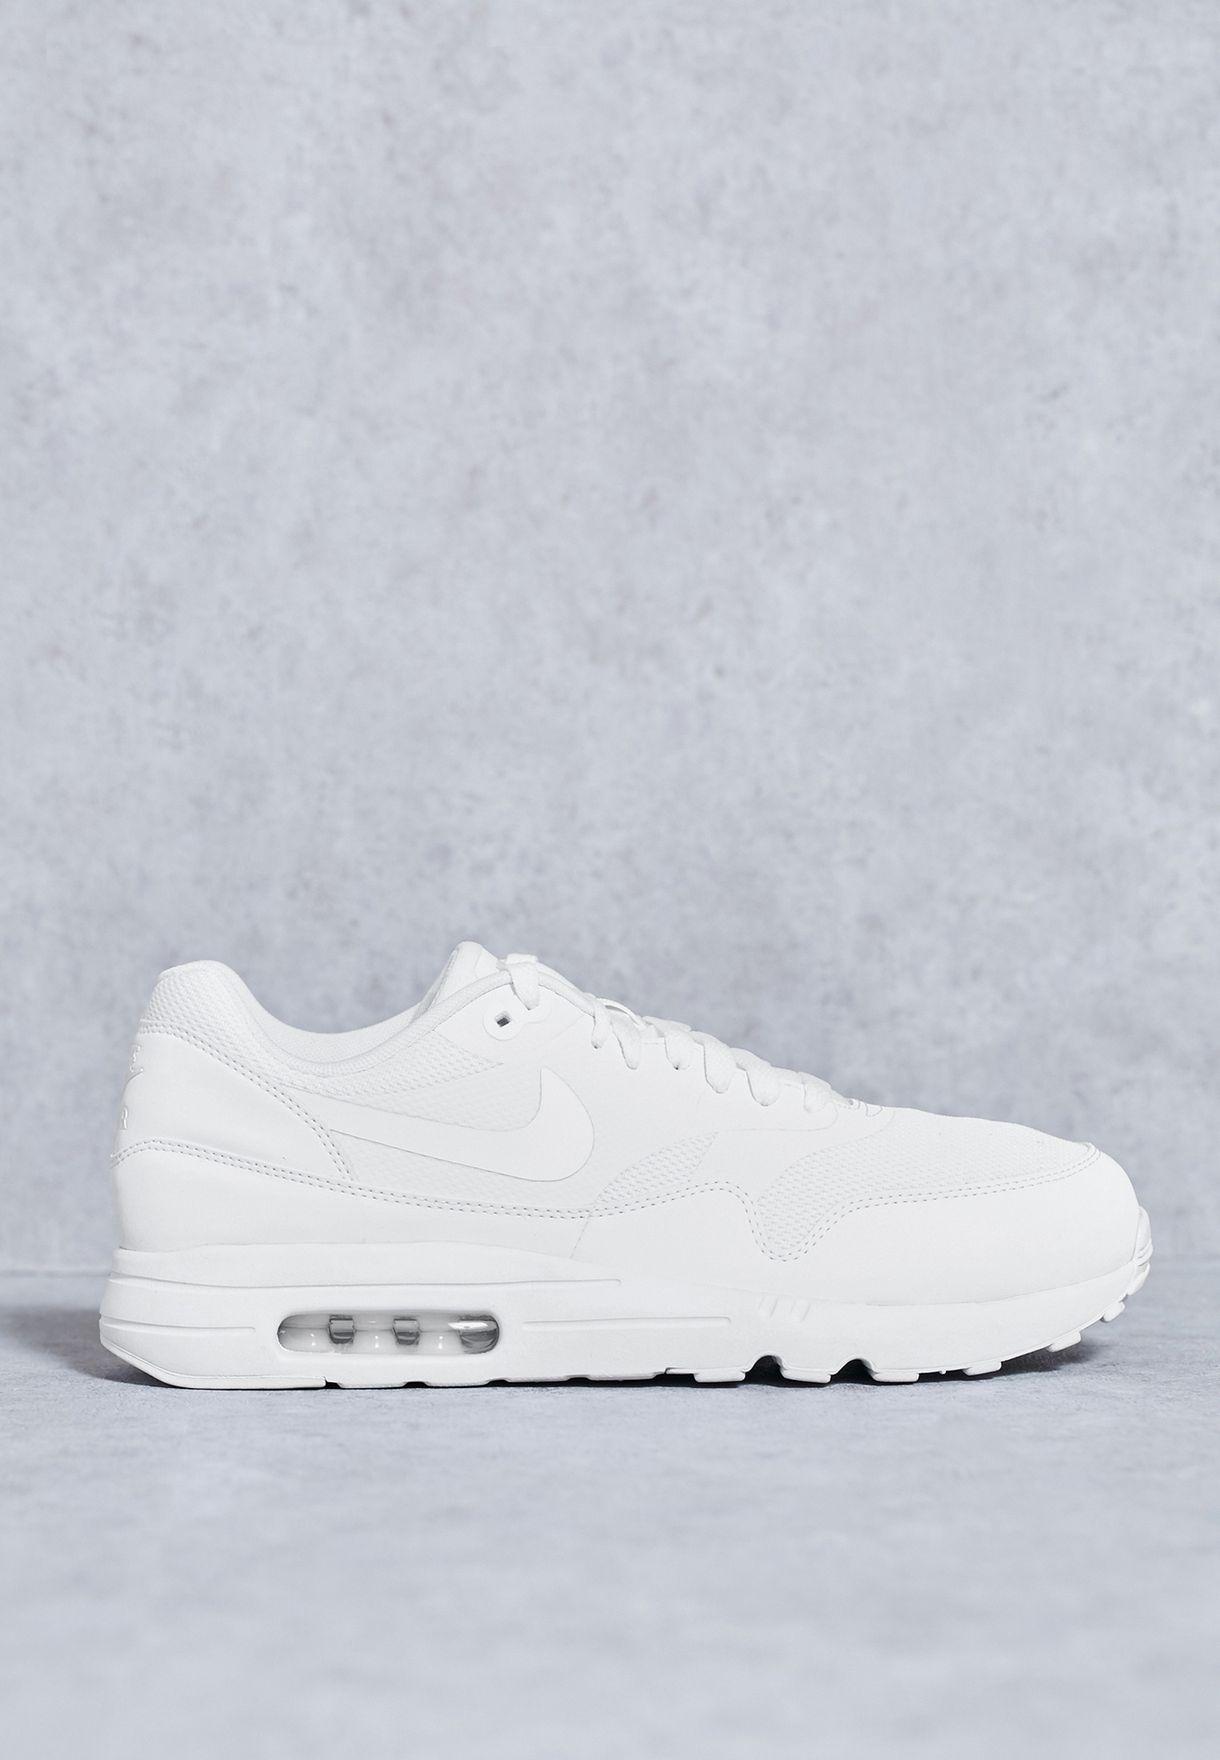 6a1a1bc8812b4 Shop Nike white Air Max 1 Ultra 2.0 Essential 875679-100 for Men in ...